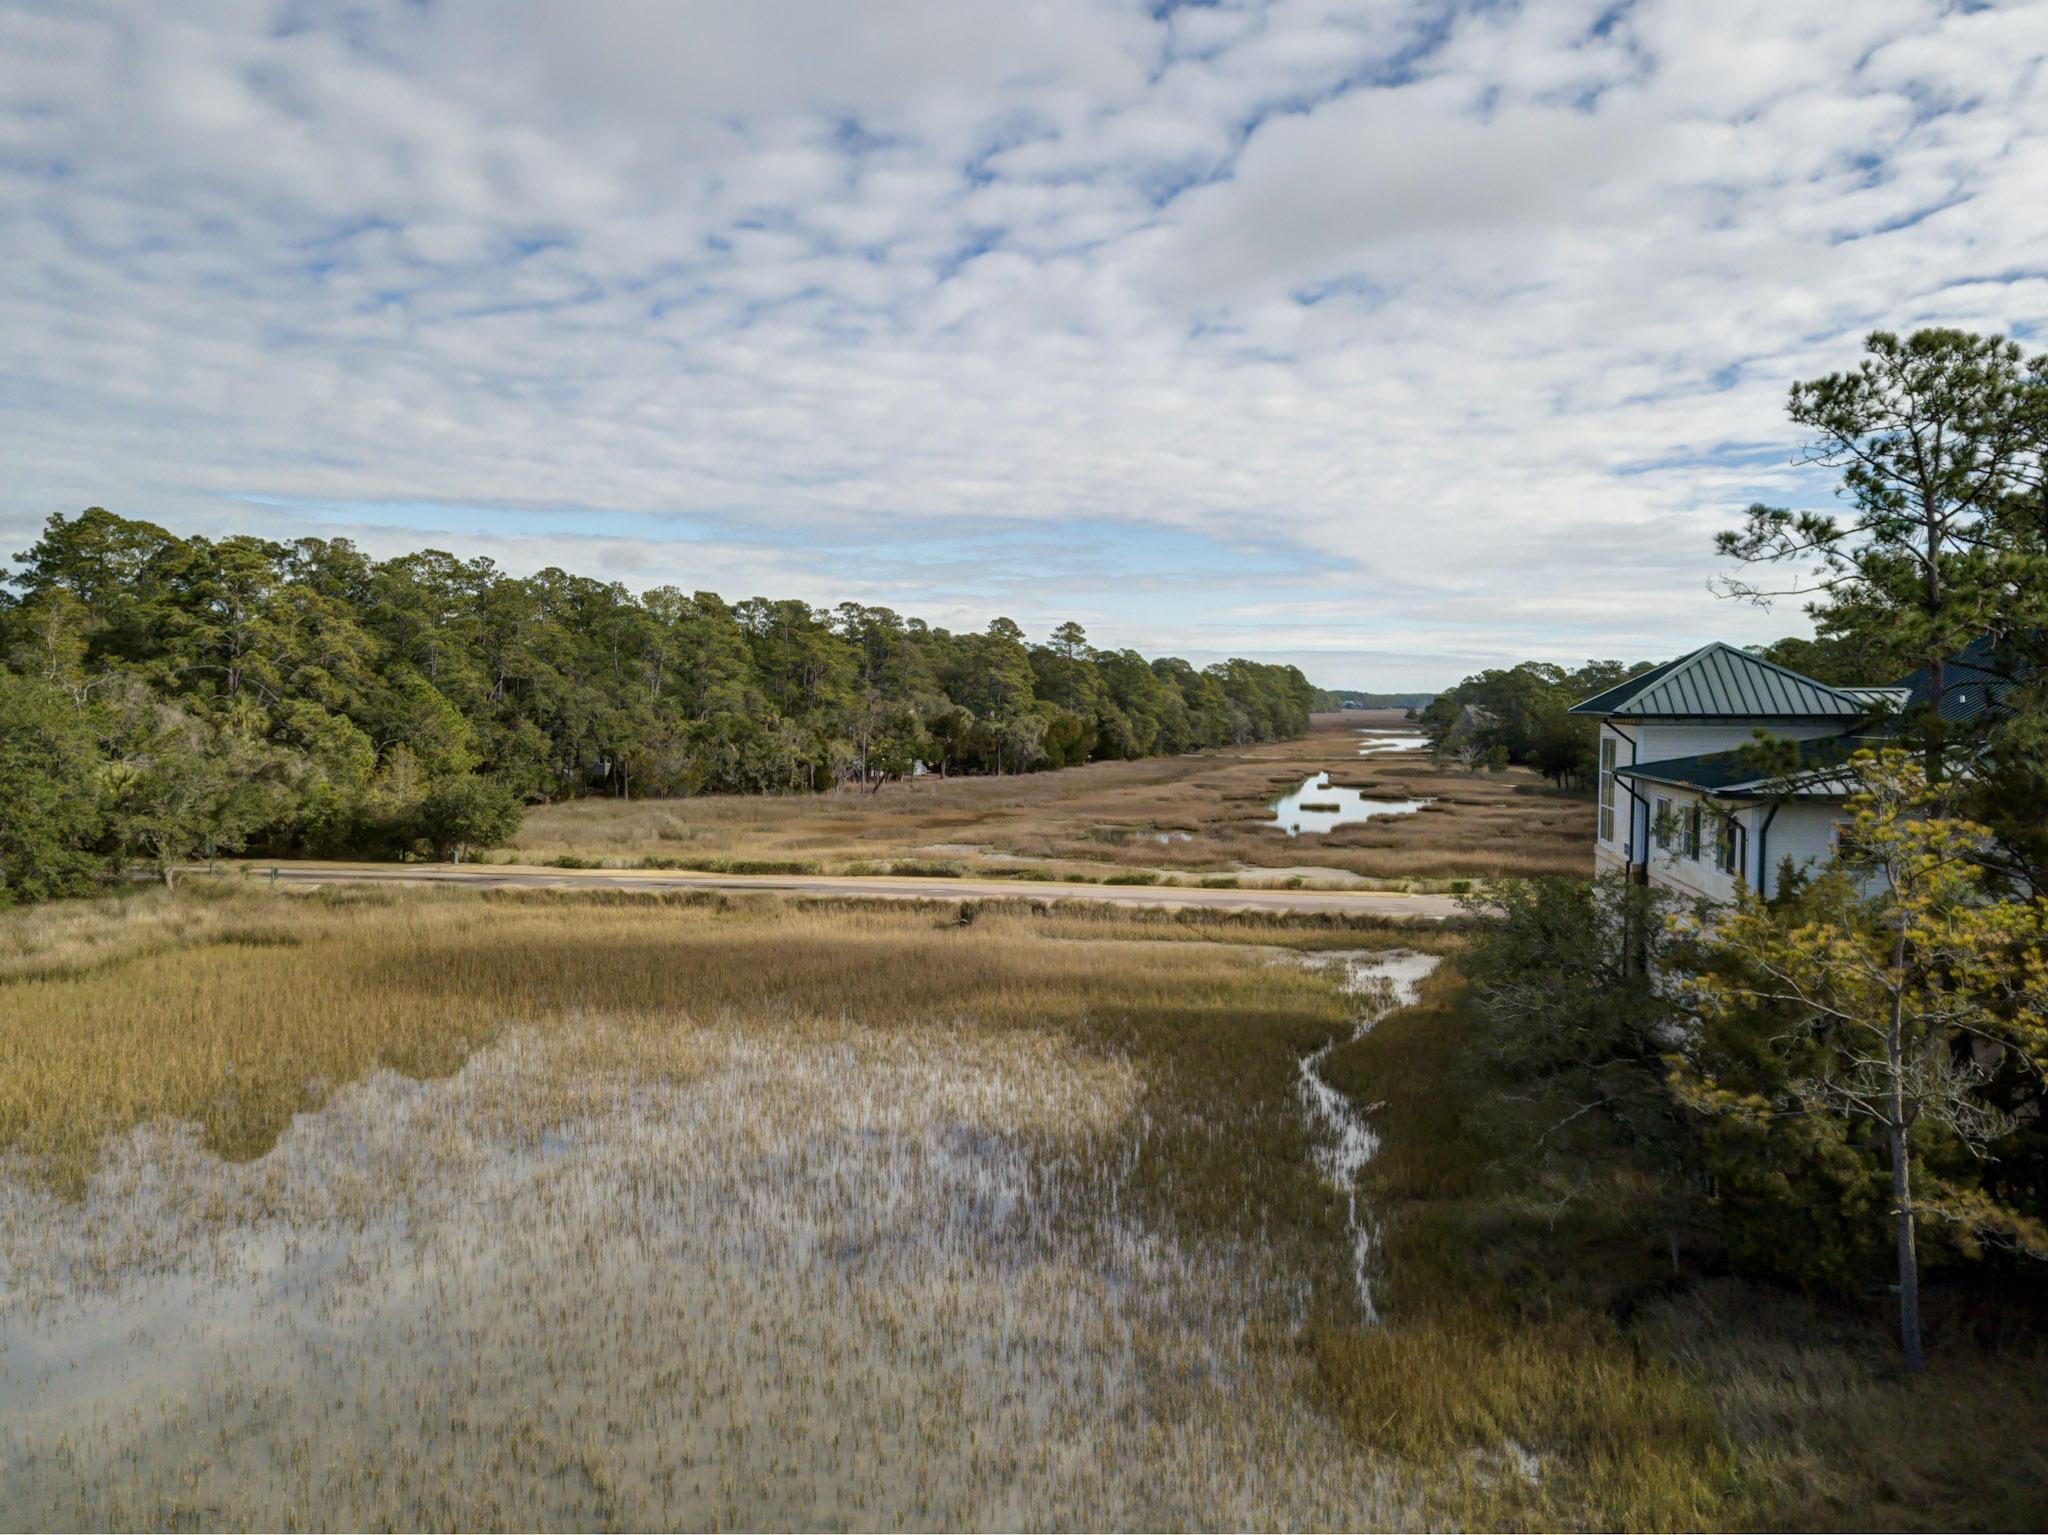 Creek Watch Villas Homes For Sale - 1244 Creek Watch, Johns Island, SC - 39